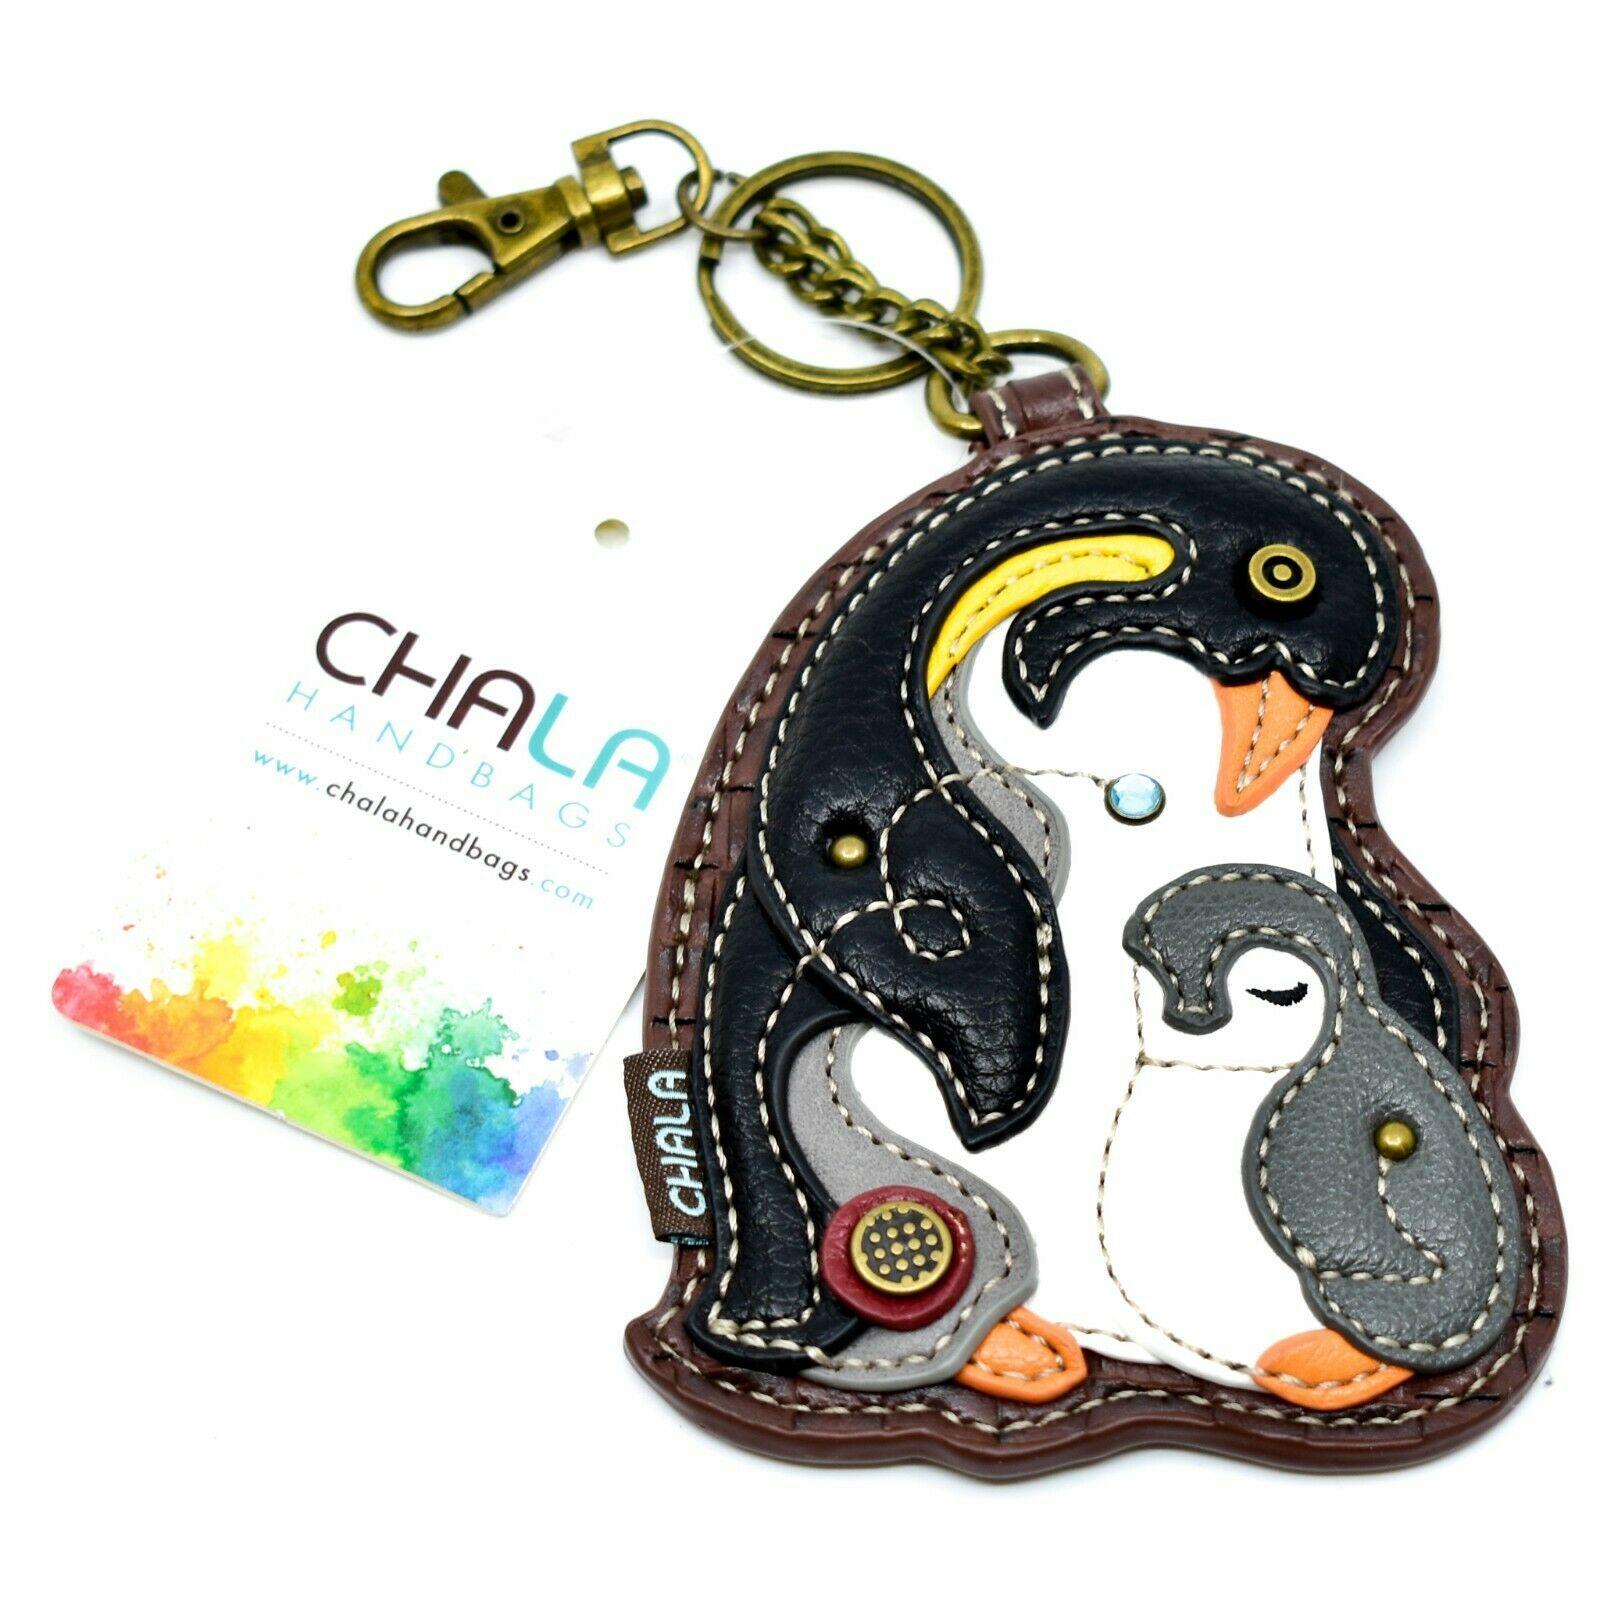 Chala Handbags Faux Leather Penguin Coin Purse Key Chain Fob Keychain